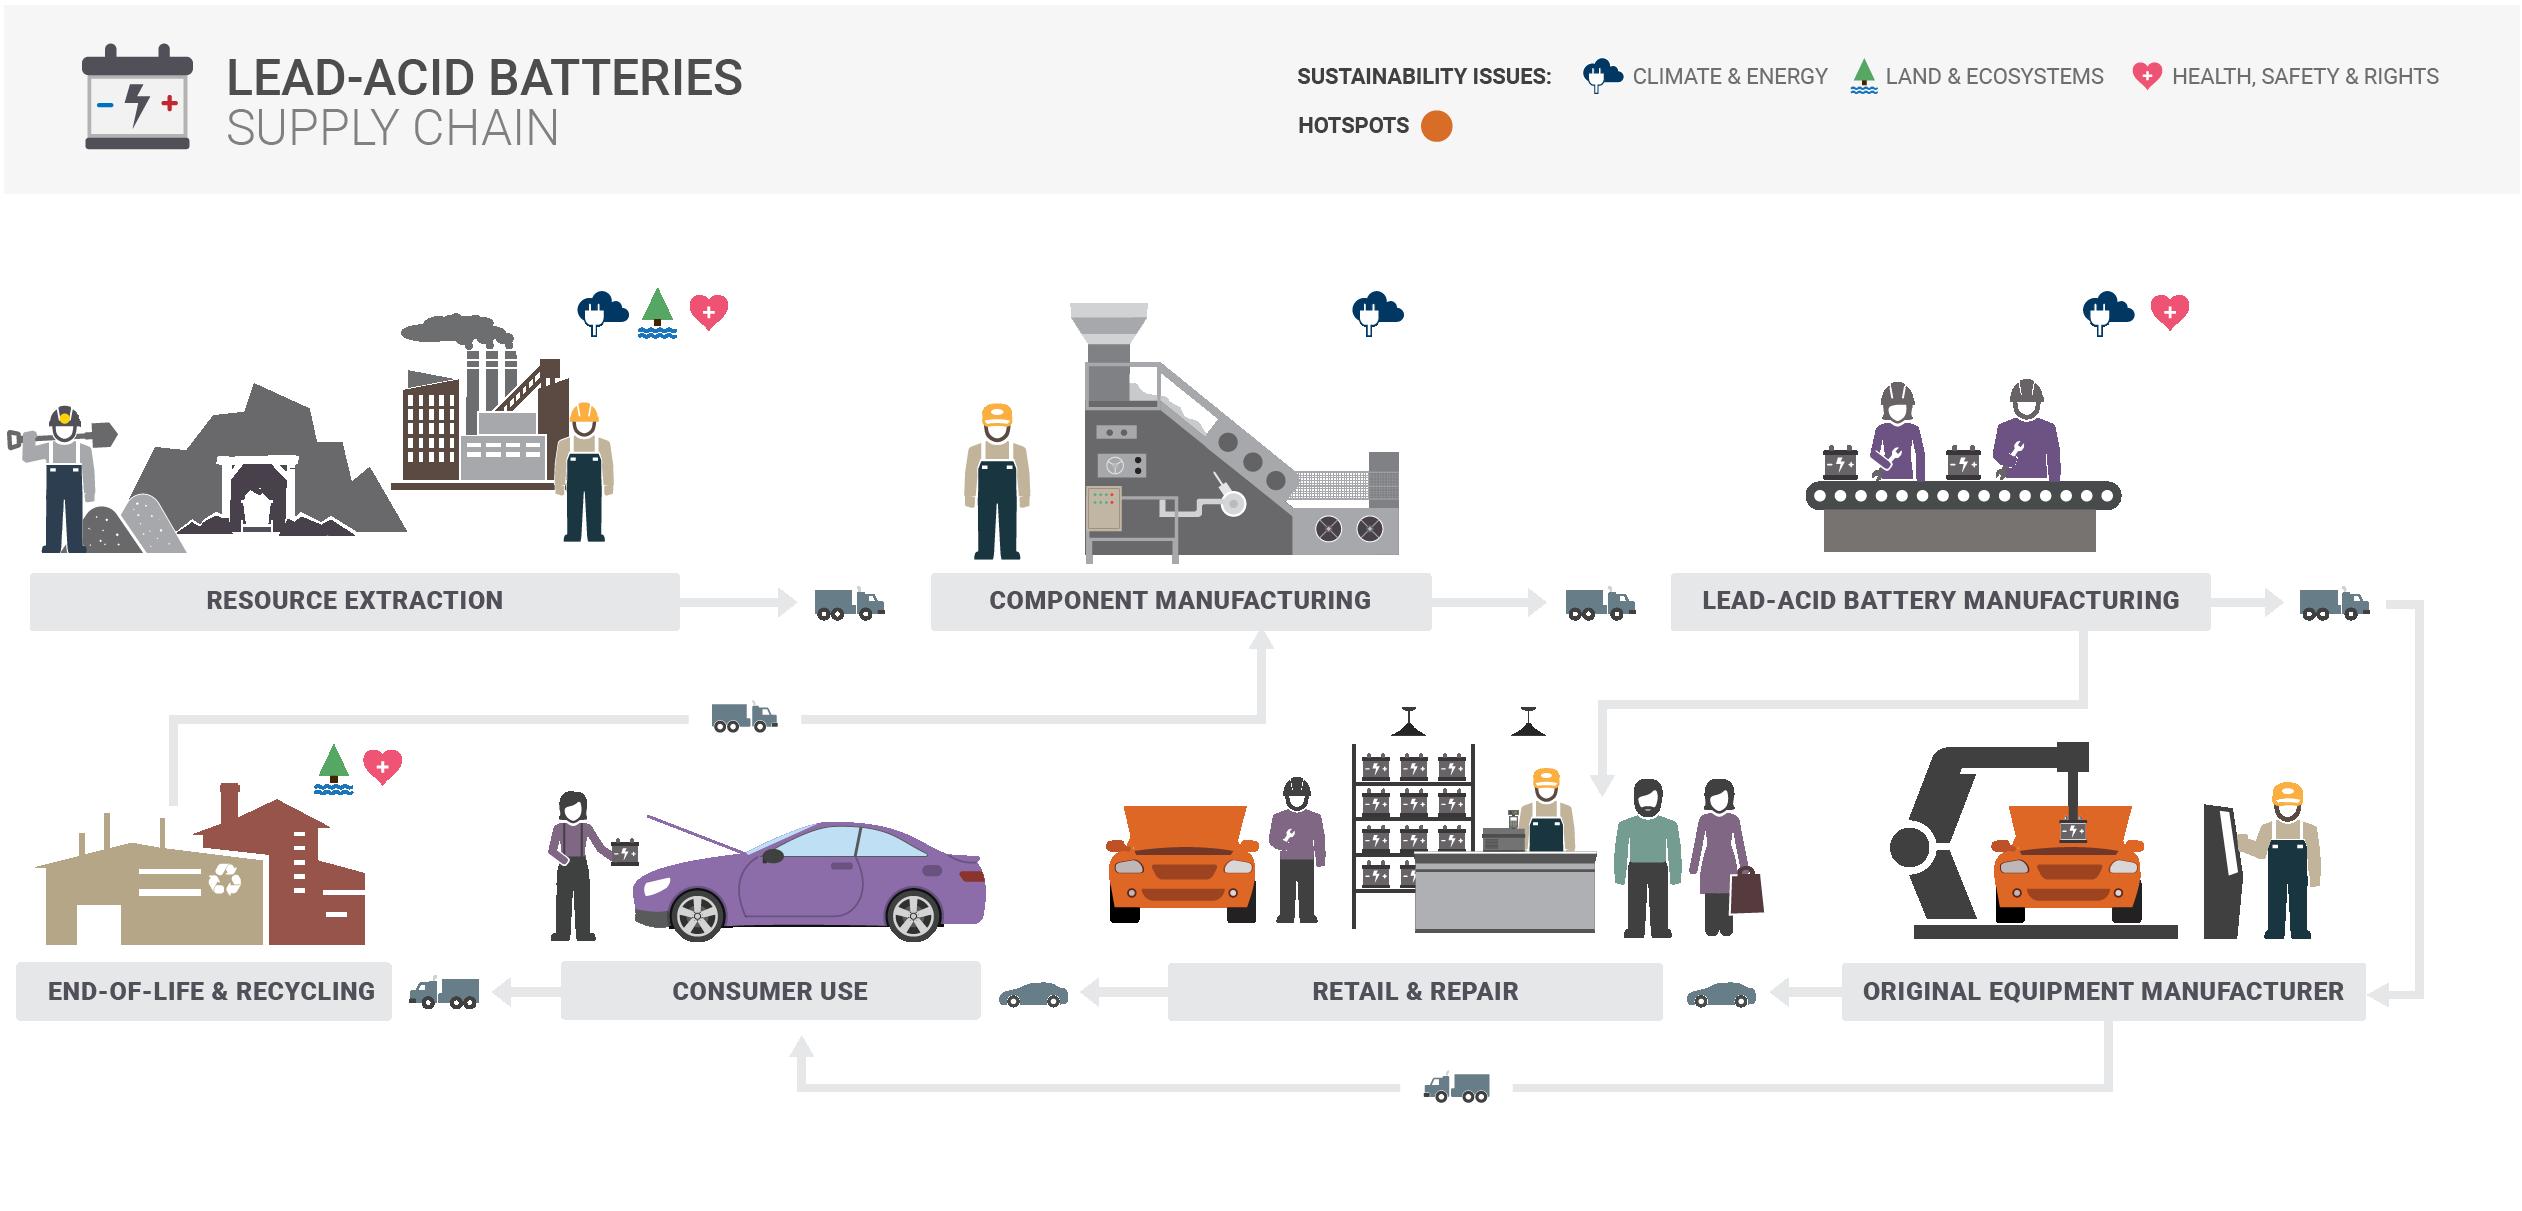 Lead-acid Batteries Supply Chain